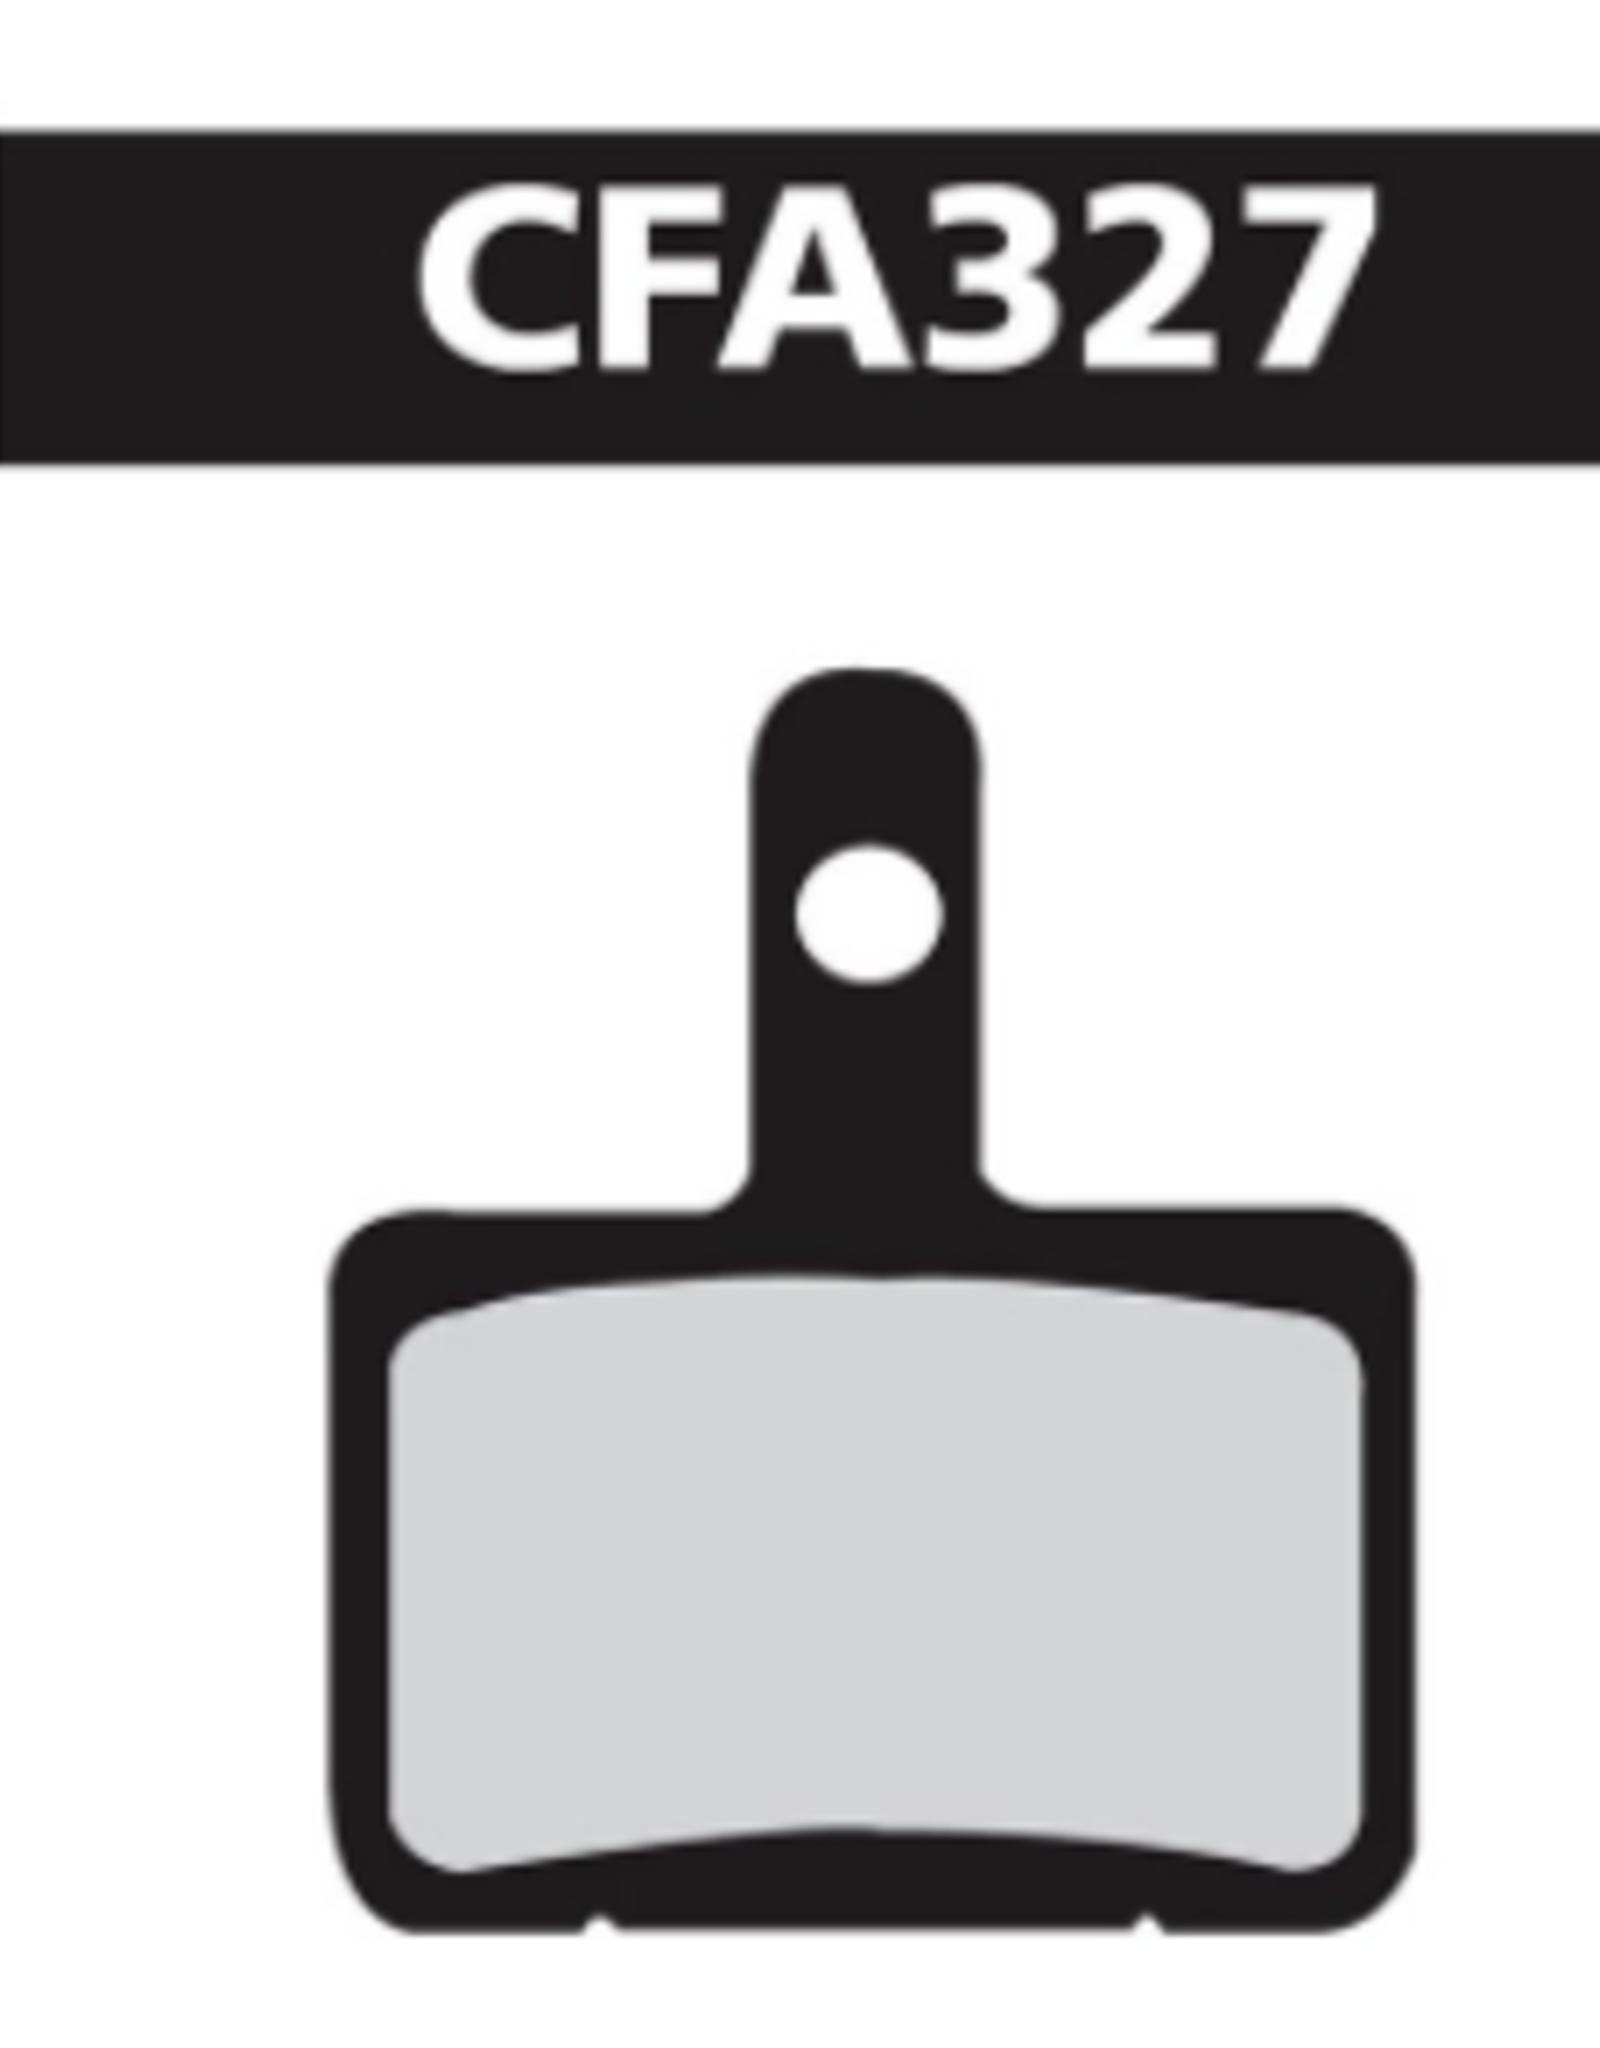 EBC EBC Disc Brake Pads - FA327 (Shimano, Tektro, TRP)